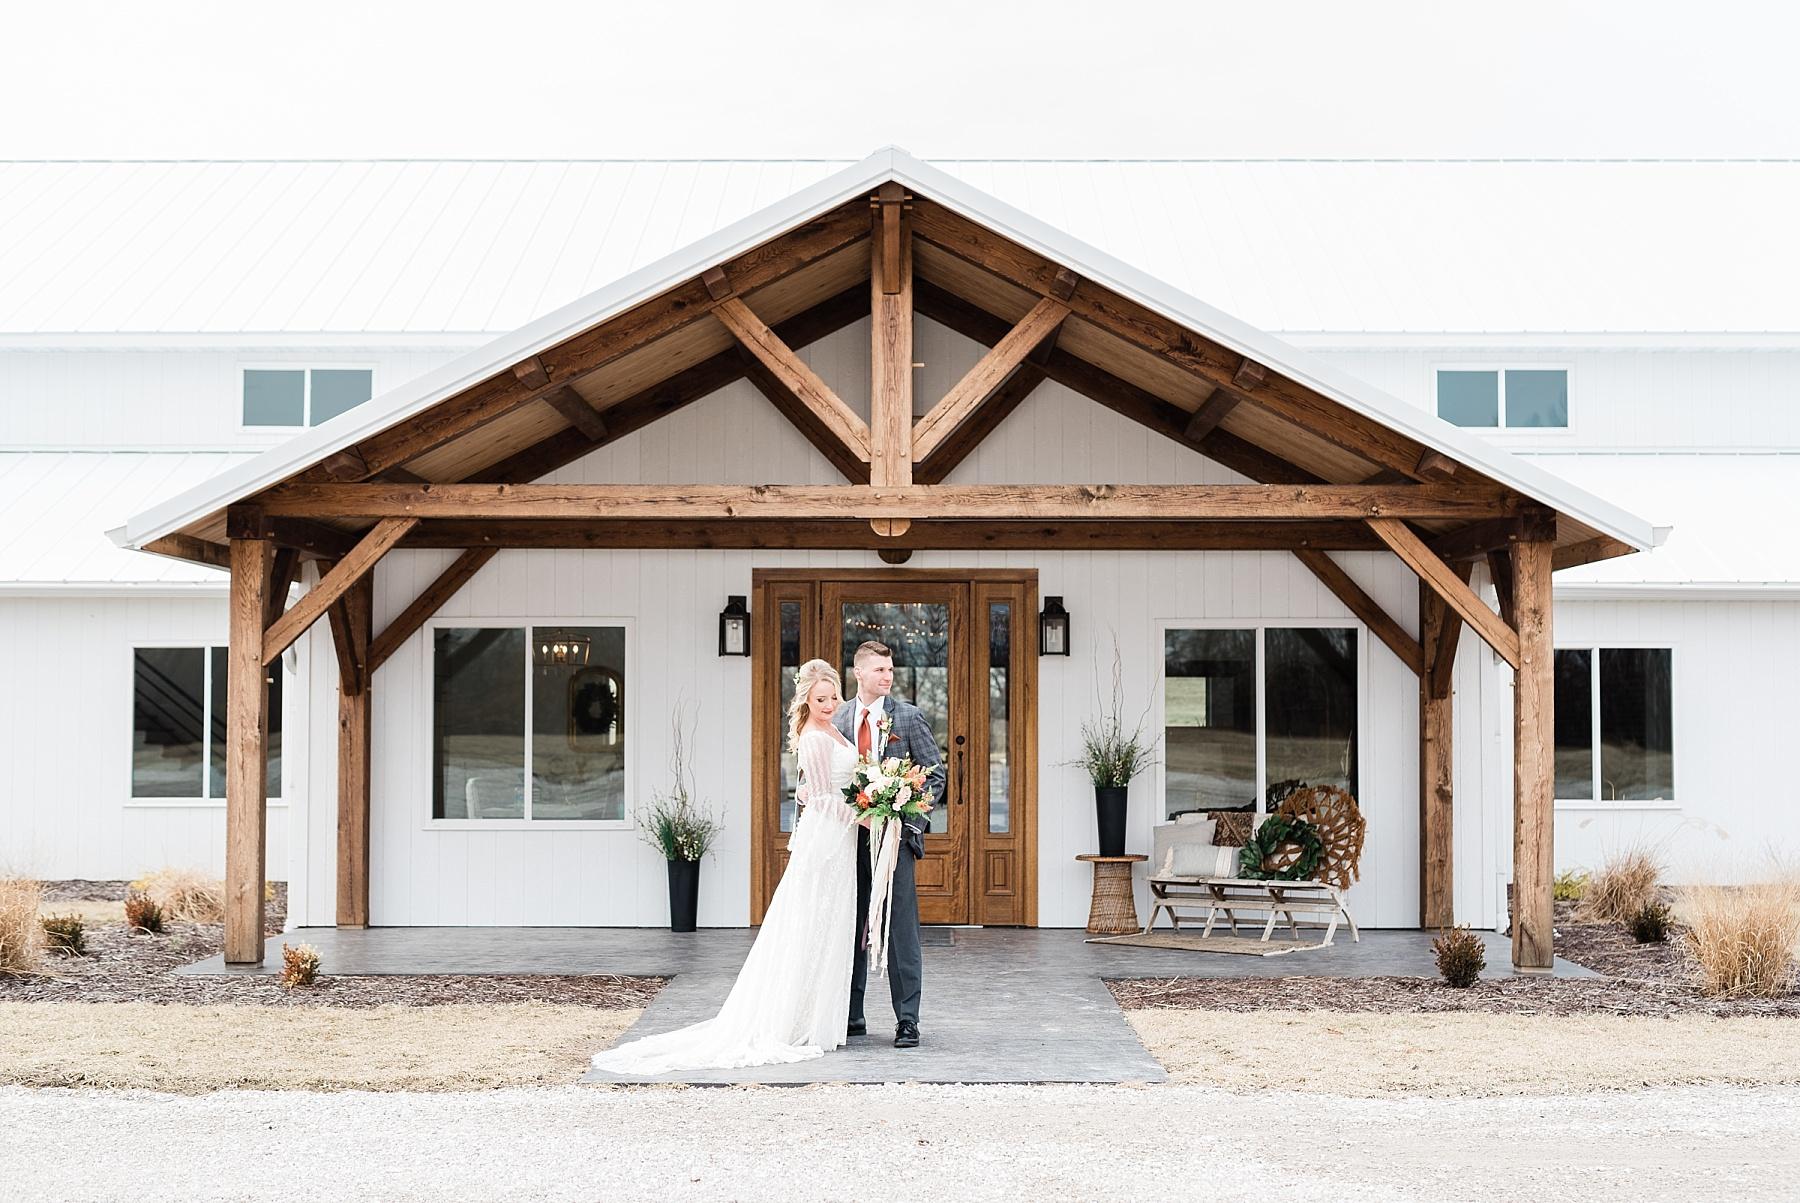 Eclectic Scandinavian Winter Wedding in All White Venue Emerson Fields by Kelsi Kliethermes Photography Best Missouri and Maui Wedding Photographer_0021.jpg